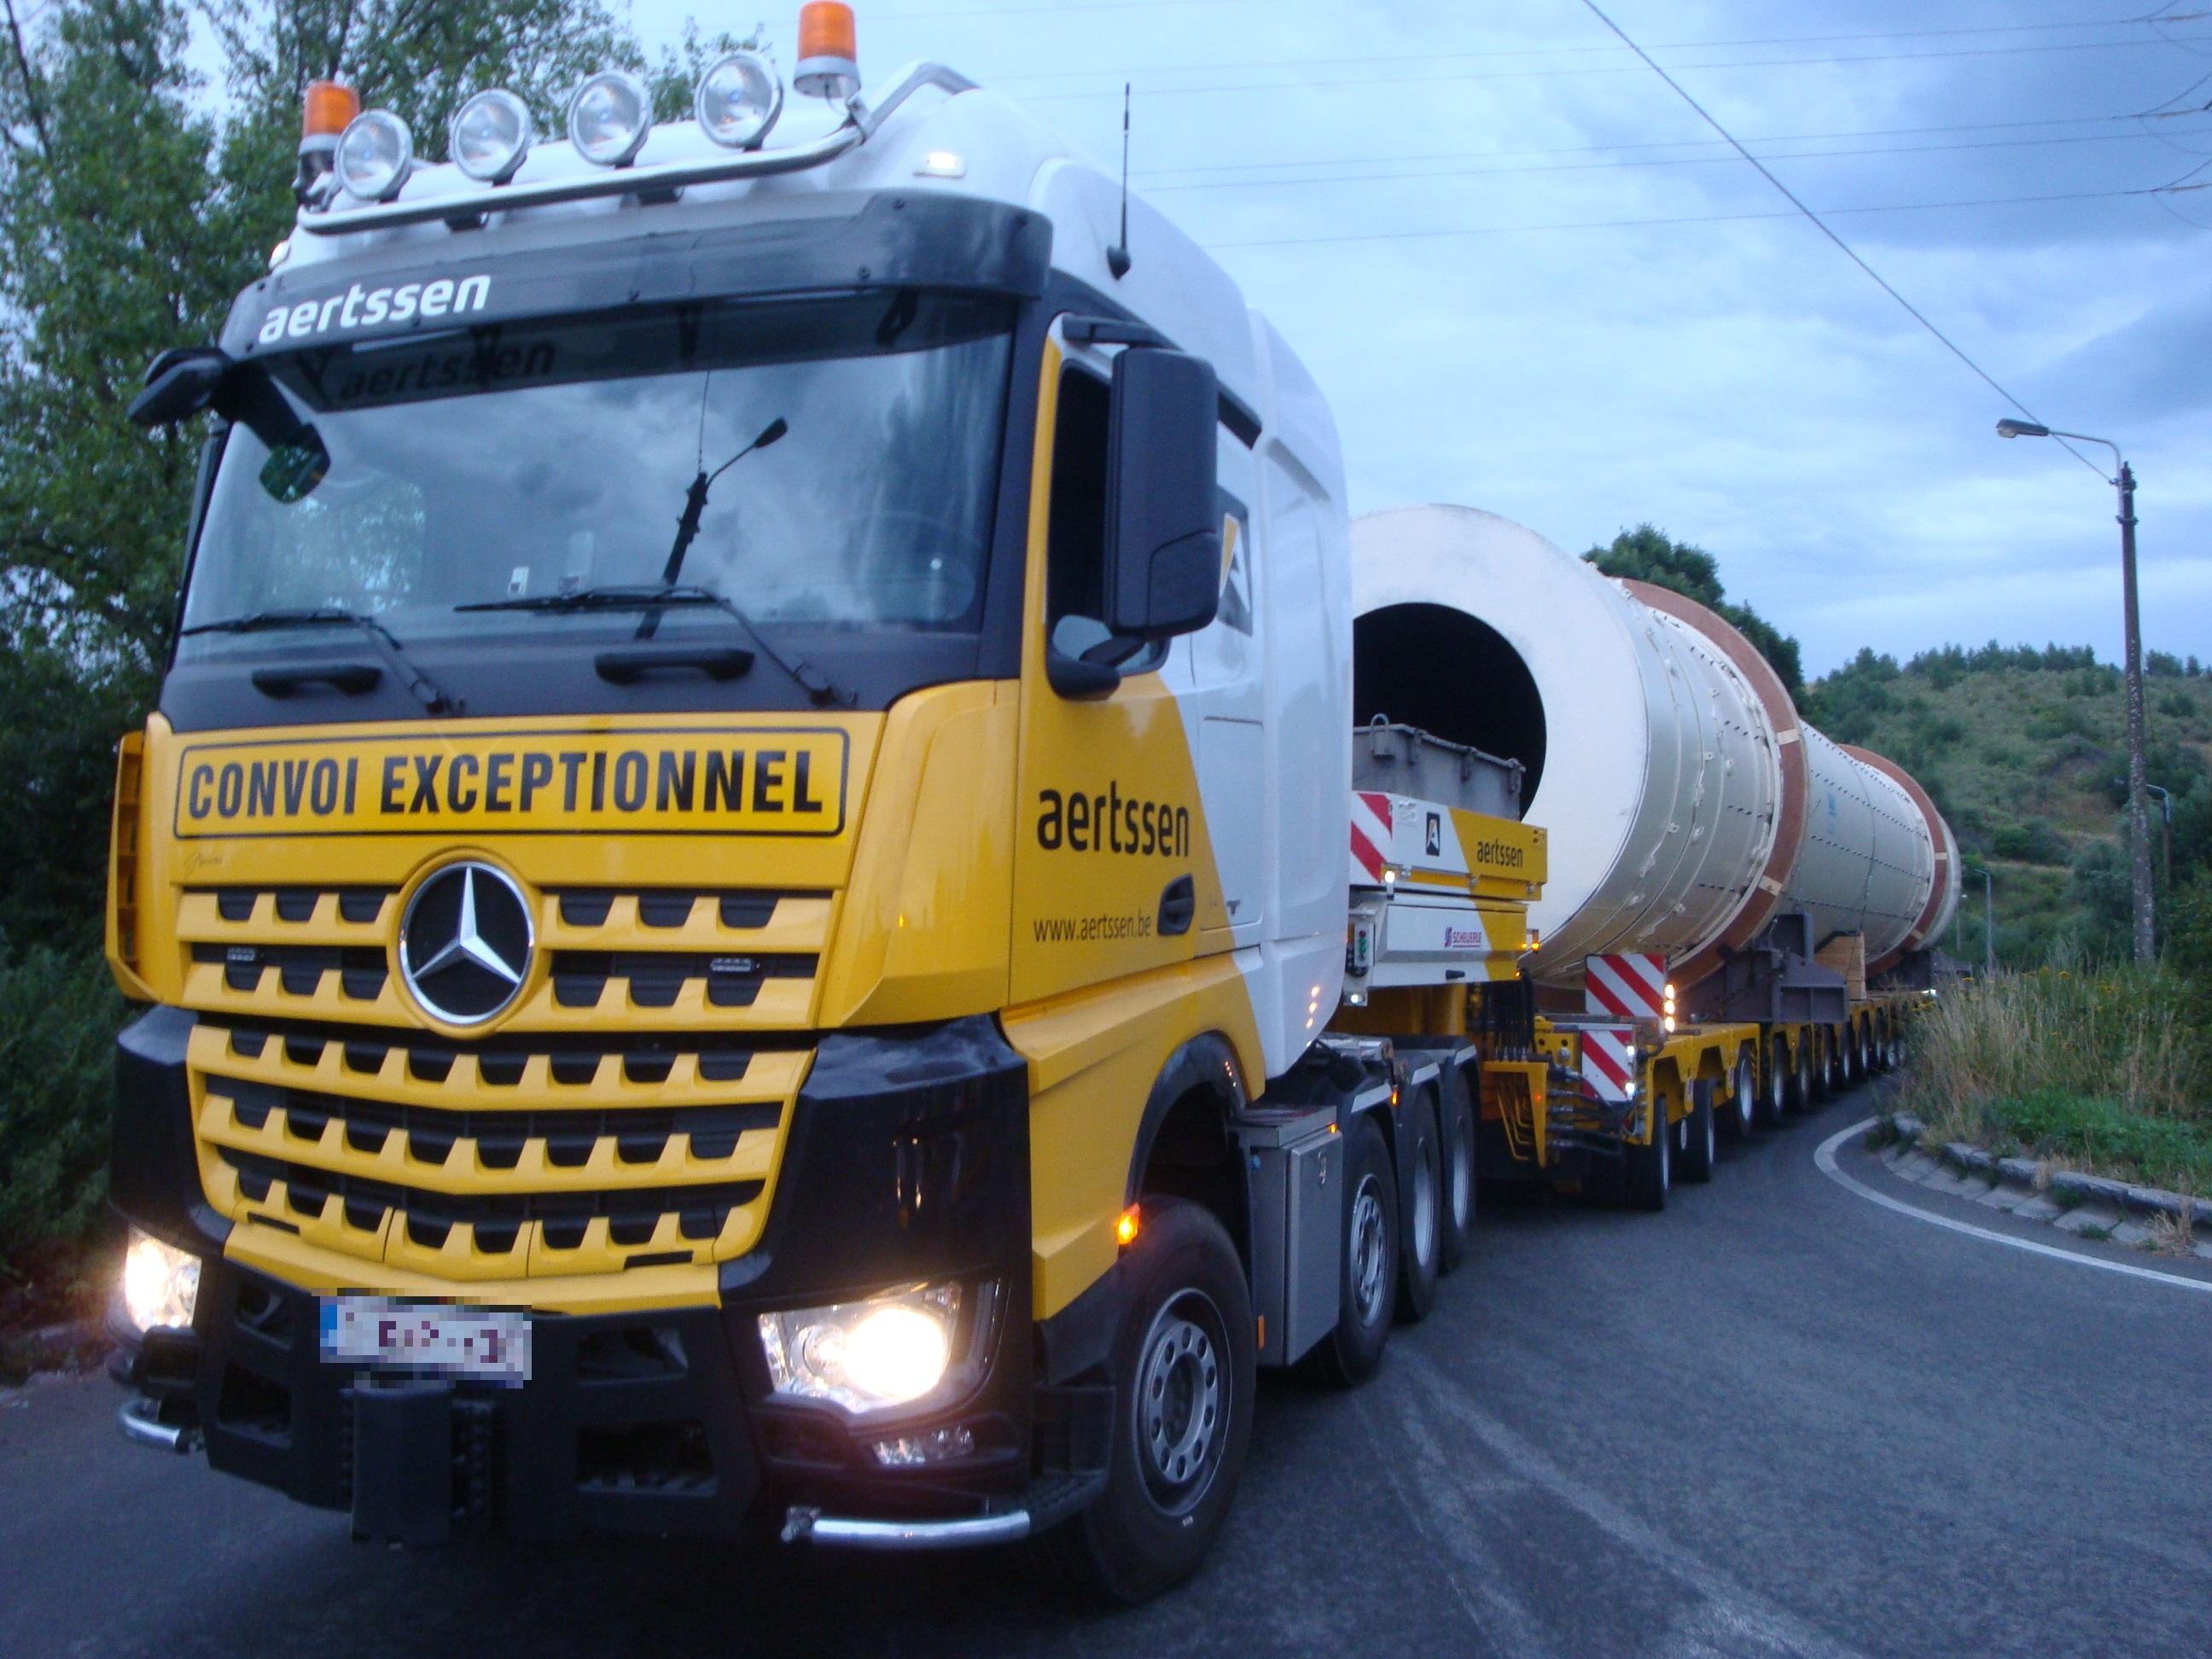 Belgian roads